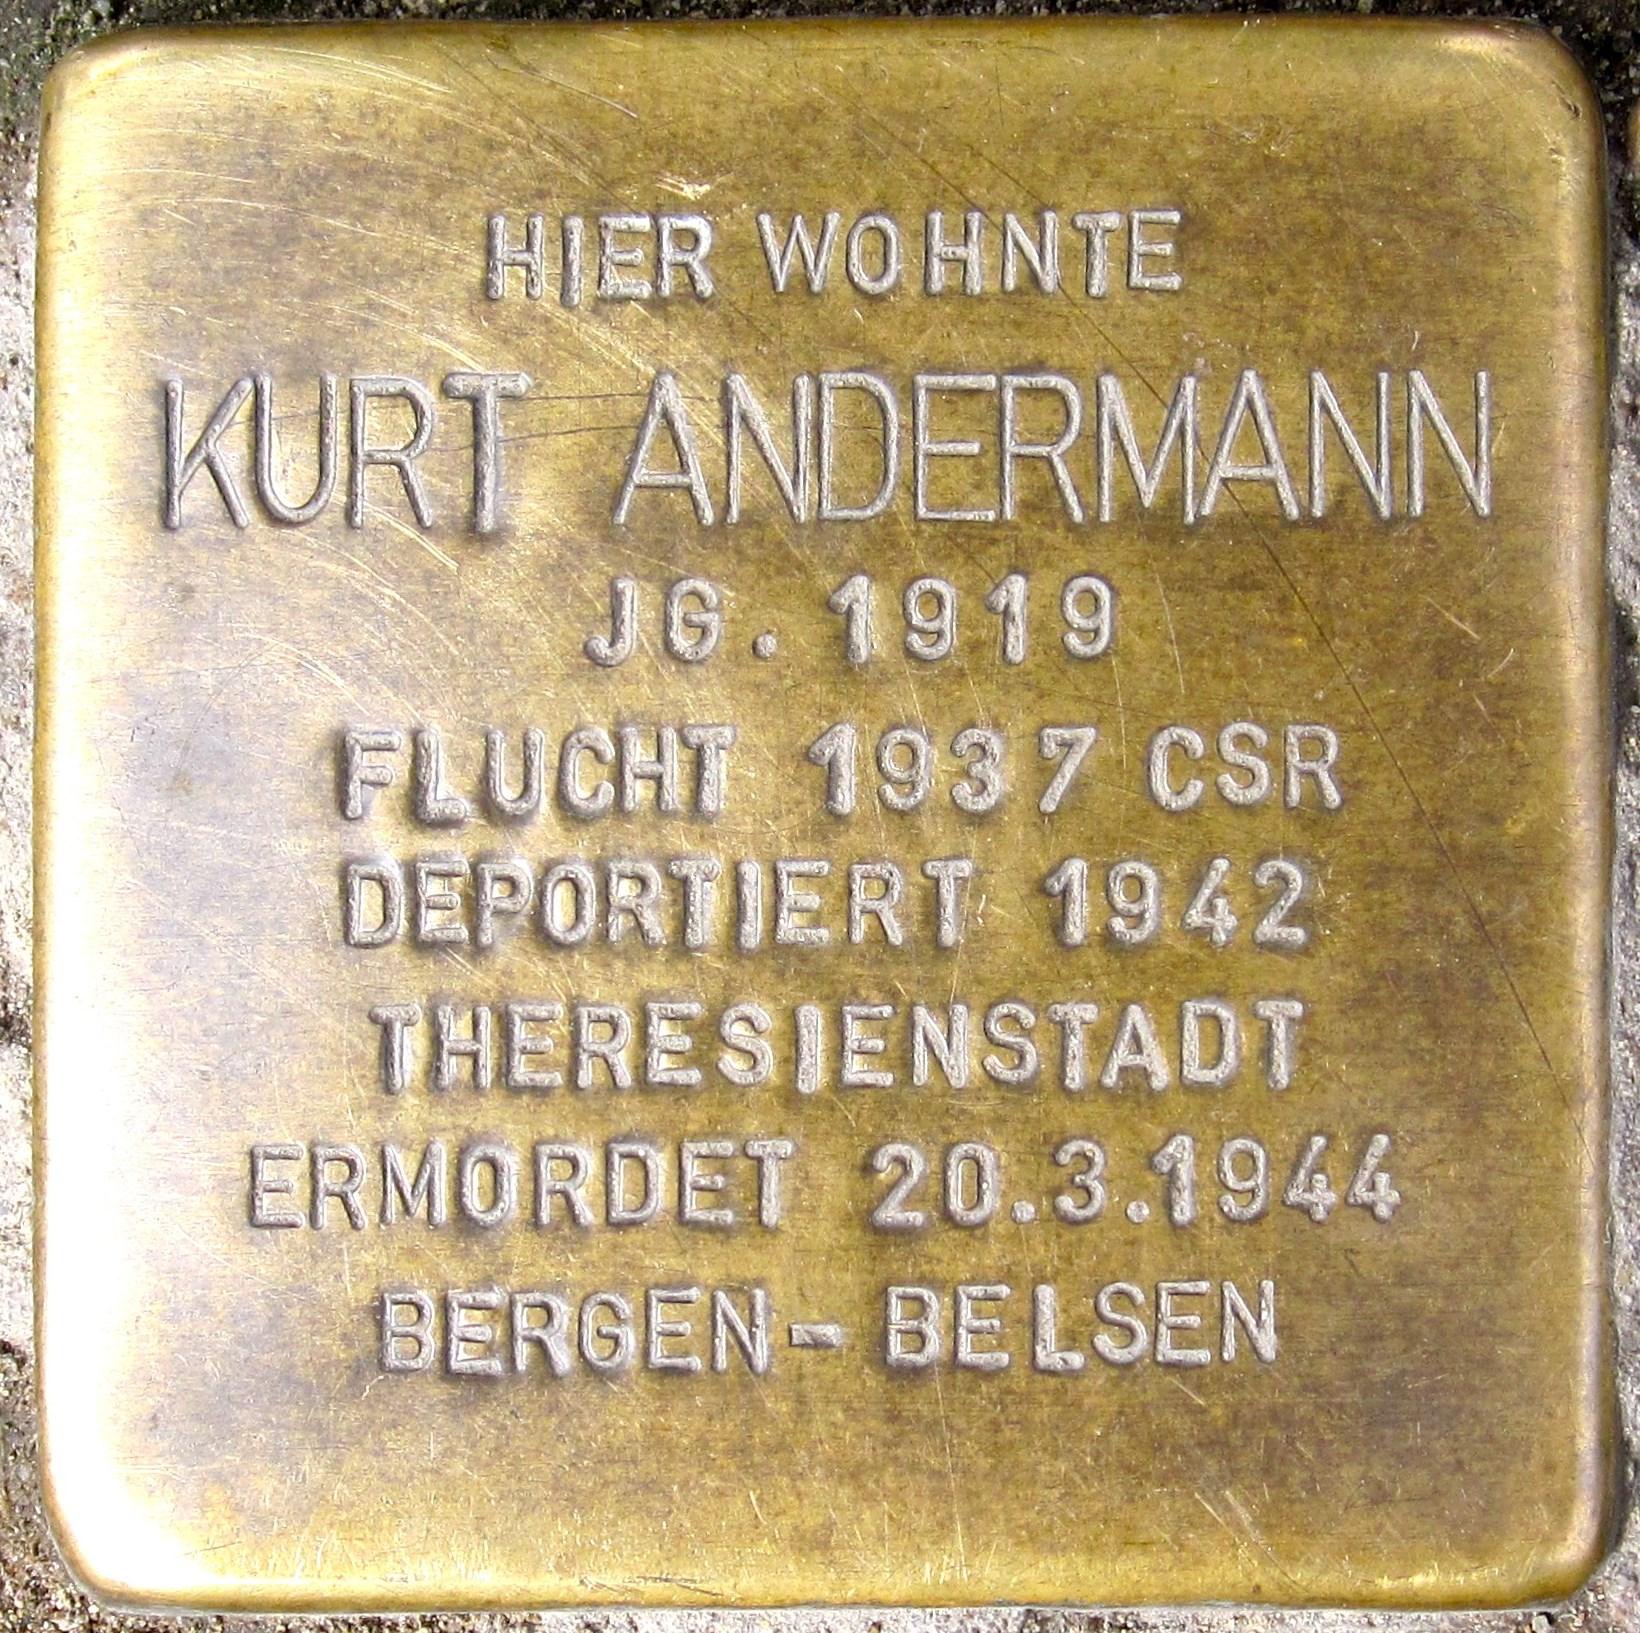 http://upload.wikimedia.org/wikipedia/commons/1/1d/Stolperstein_Andermann_BS.jpg